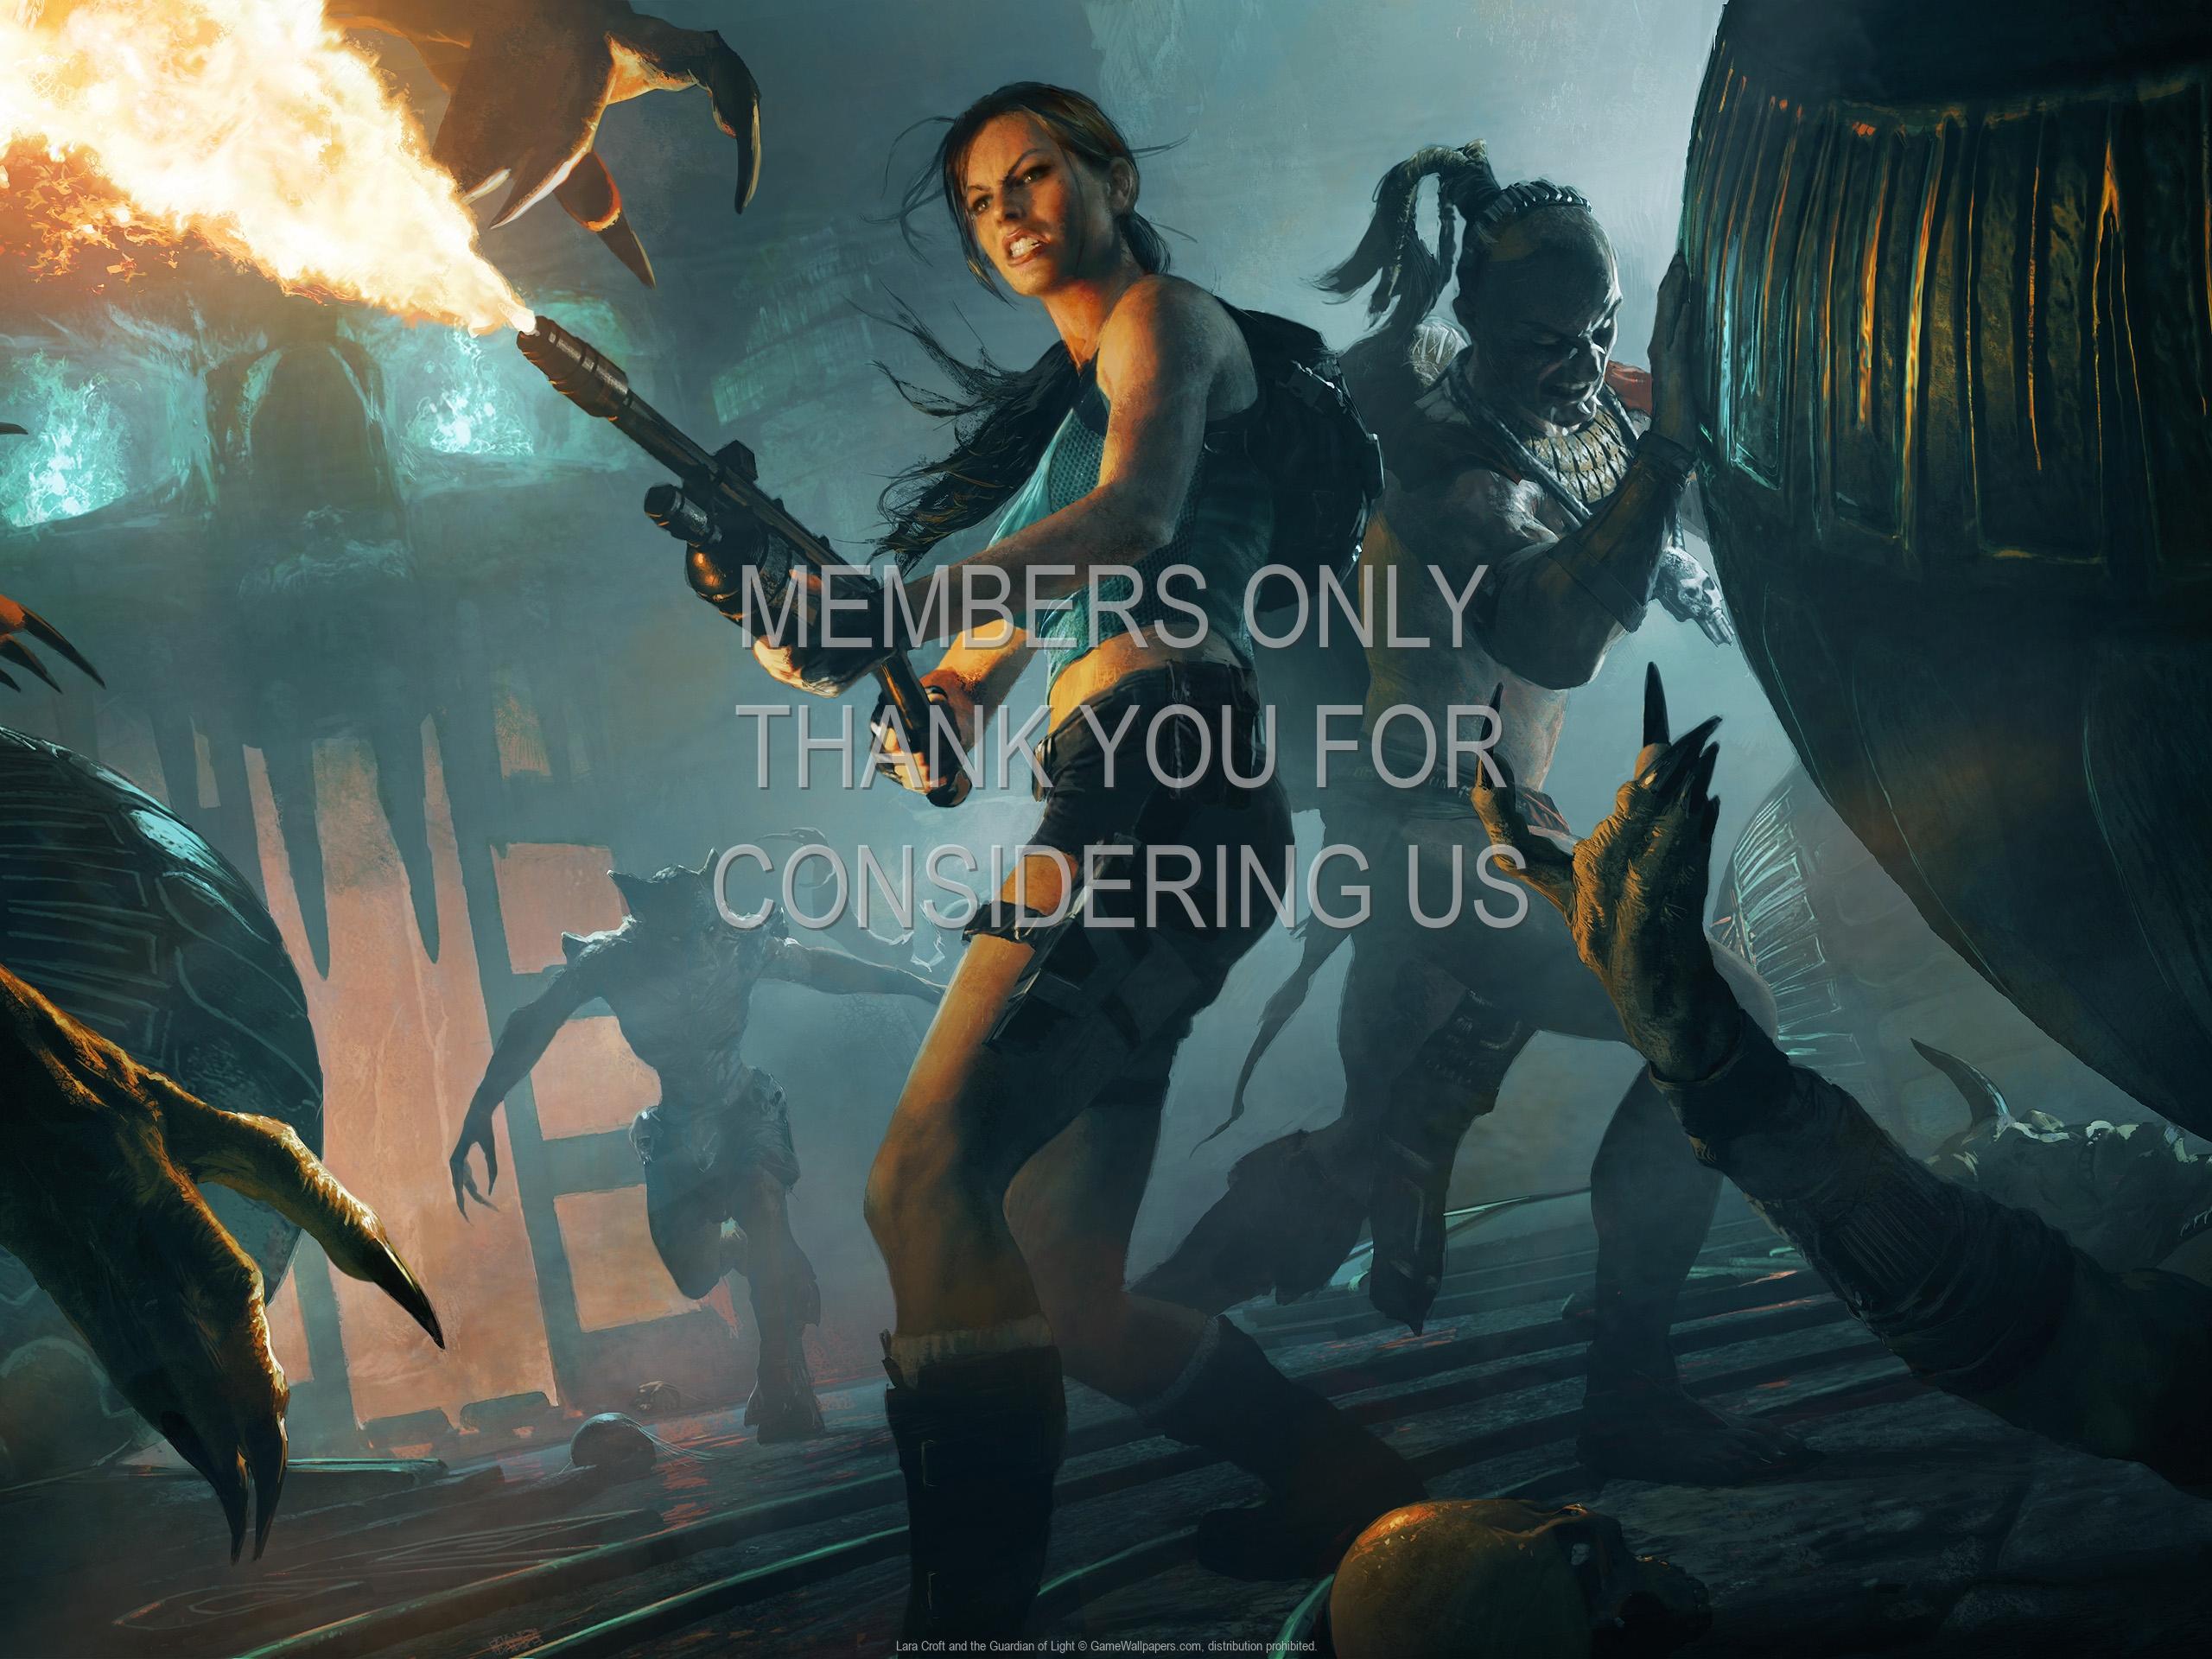 Lara Croft and the Guardian of Light 1920x1080 Handy Hintergrundbild 02